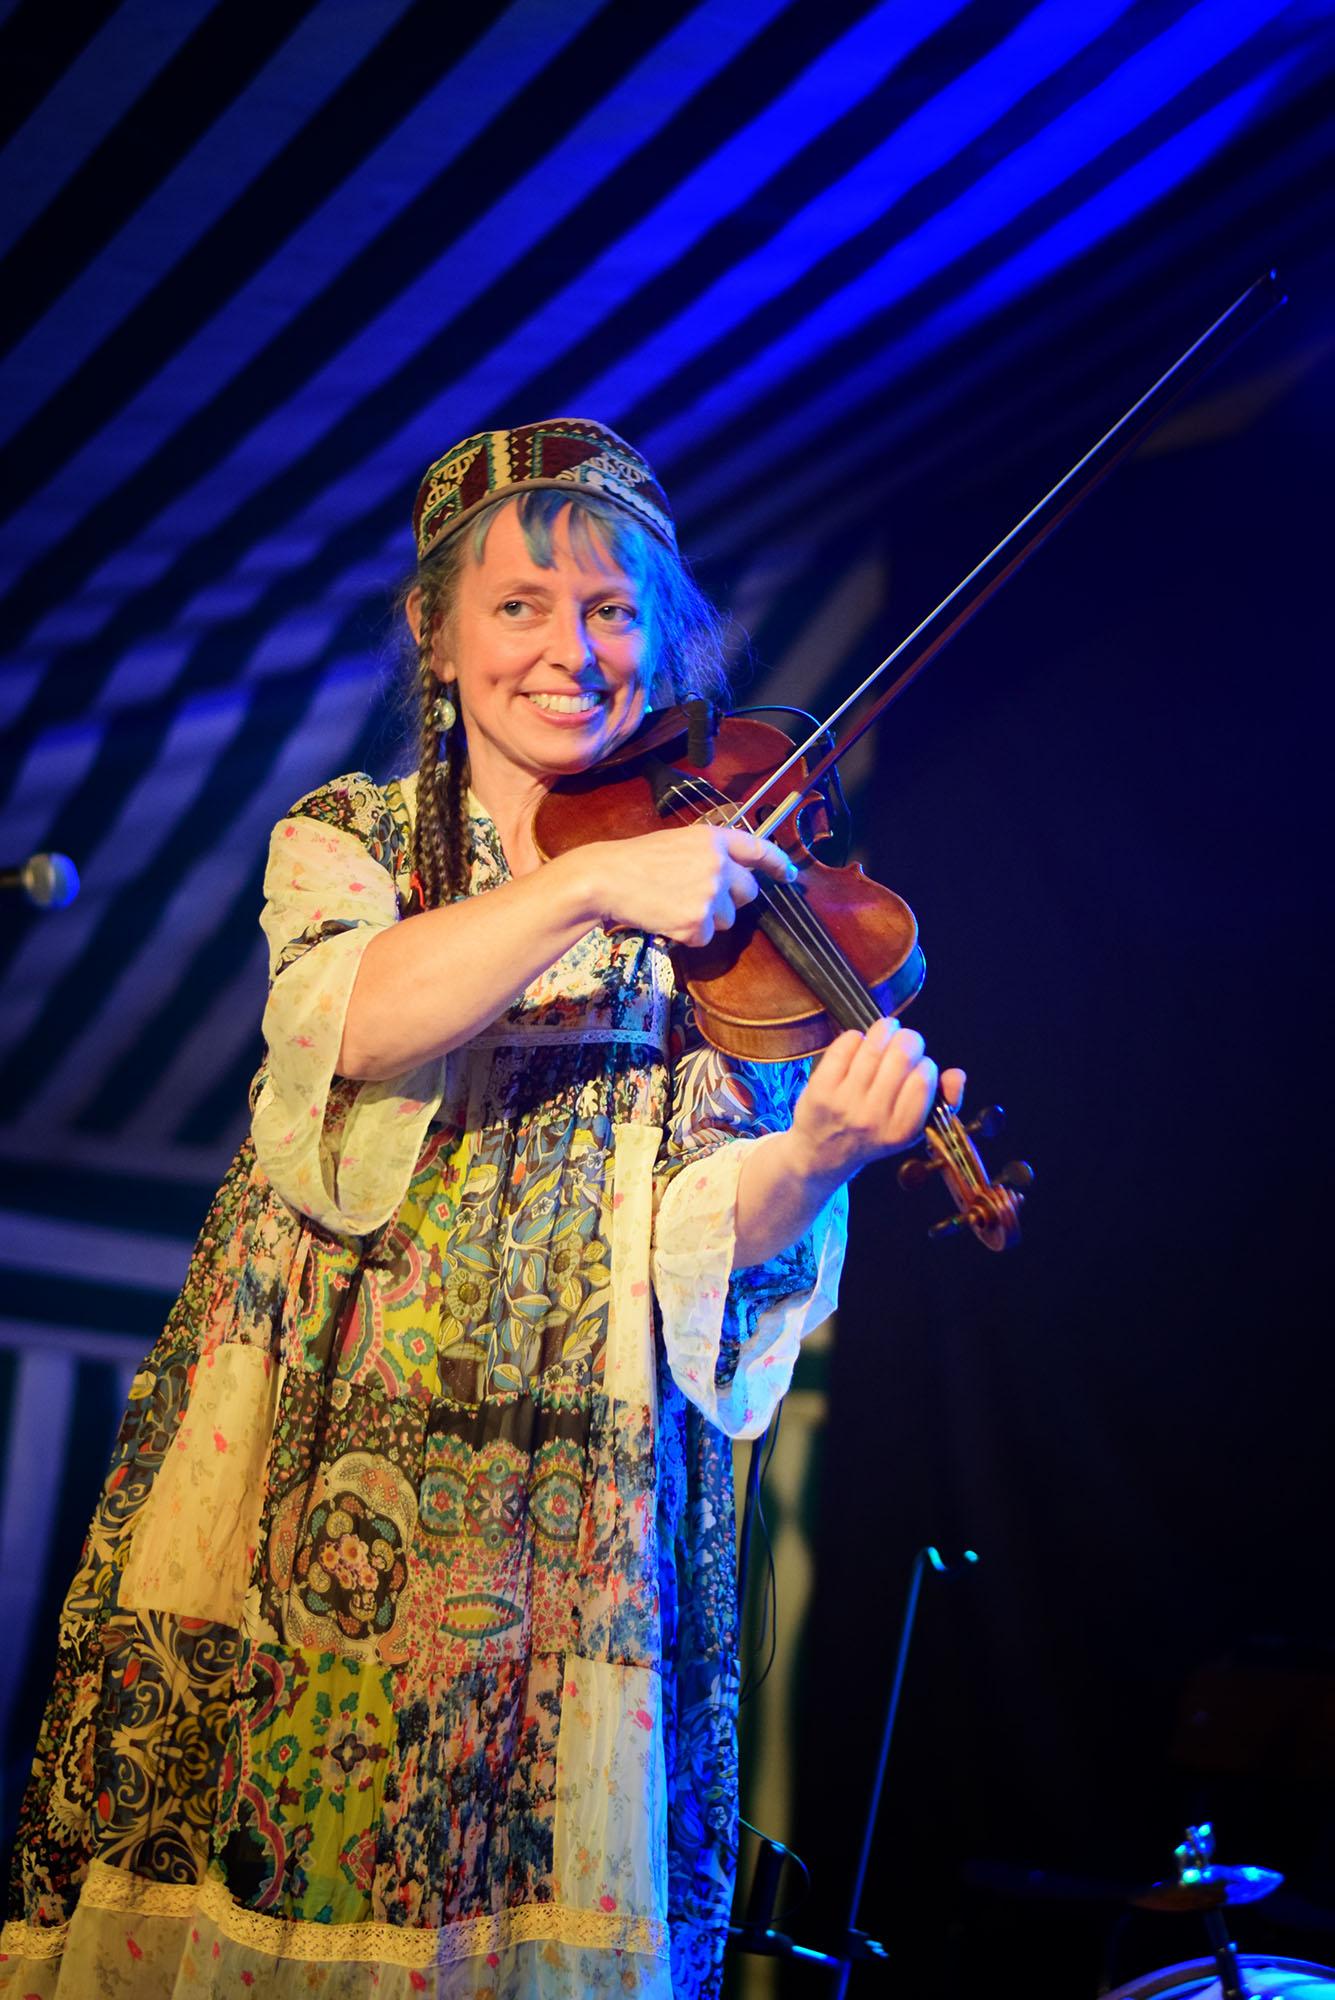 Heidi Erbrich Danzas sin fronteras Besarabia